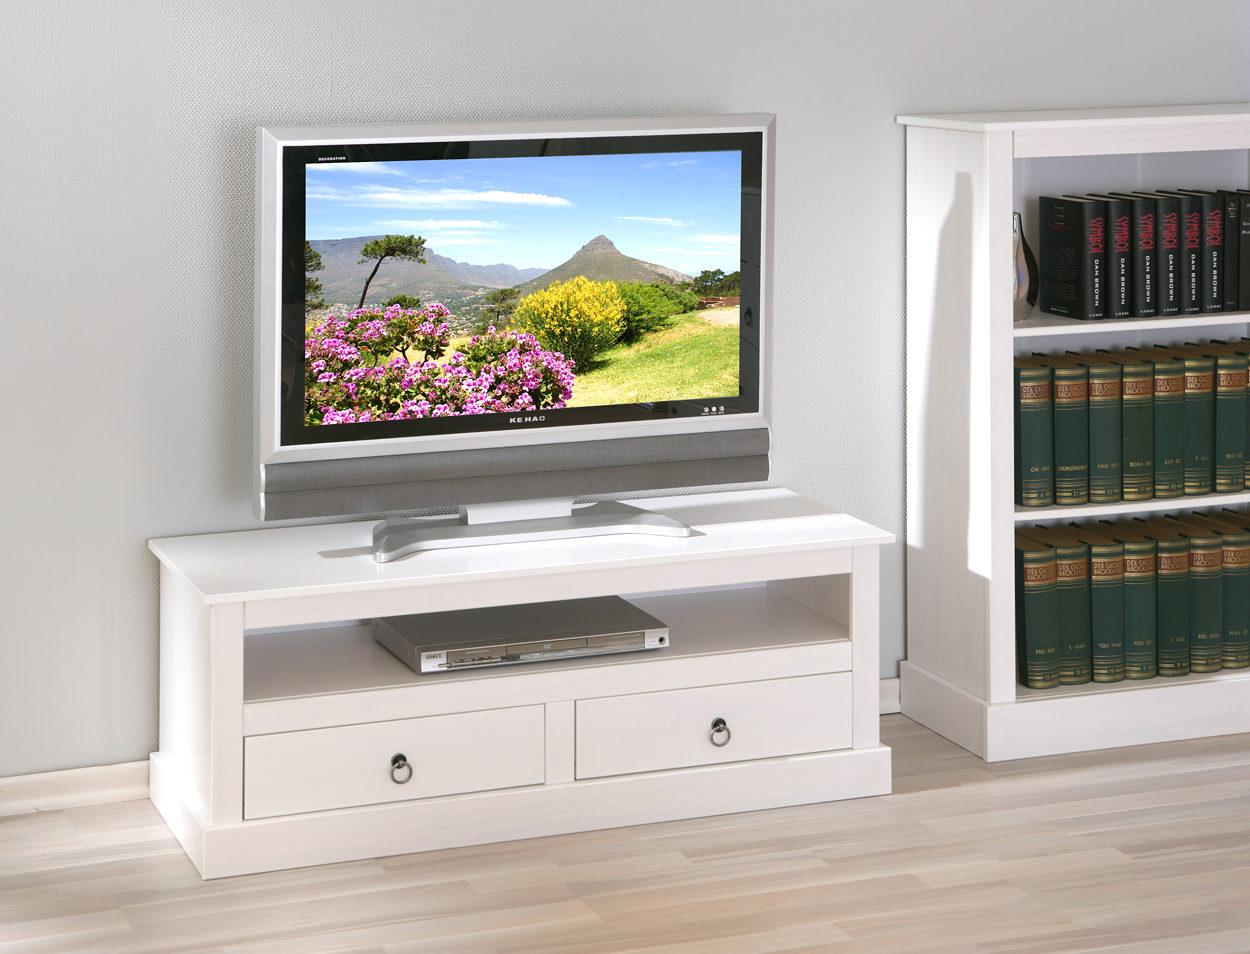 Hifi Schränke möbel brameyer möbel a z tv medienmöbel hifi möbel tv